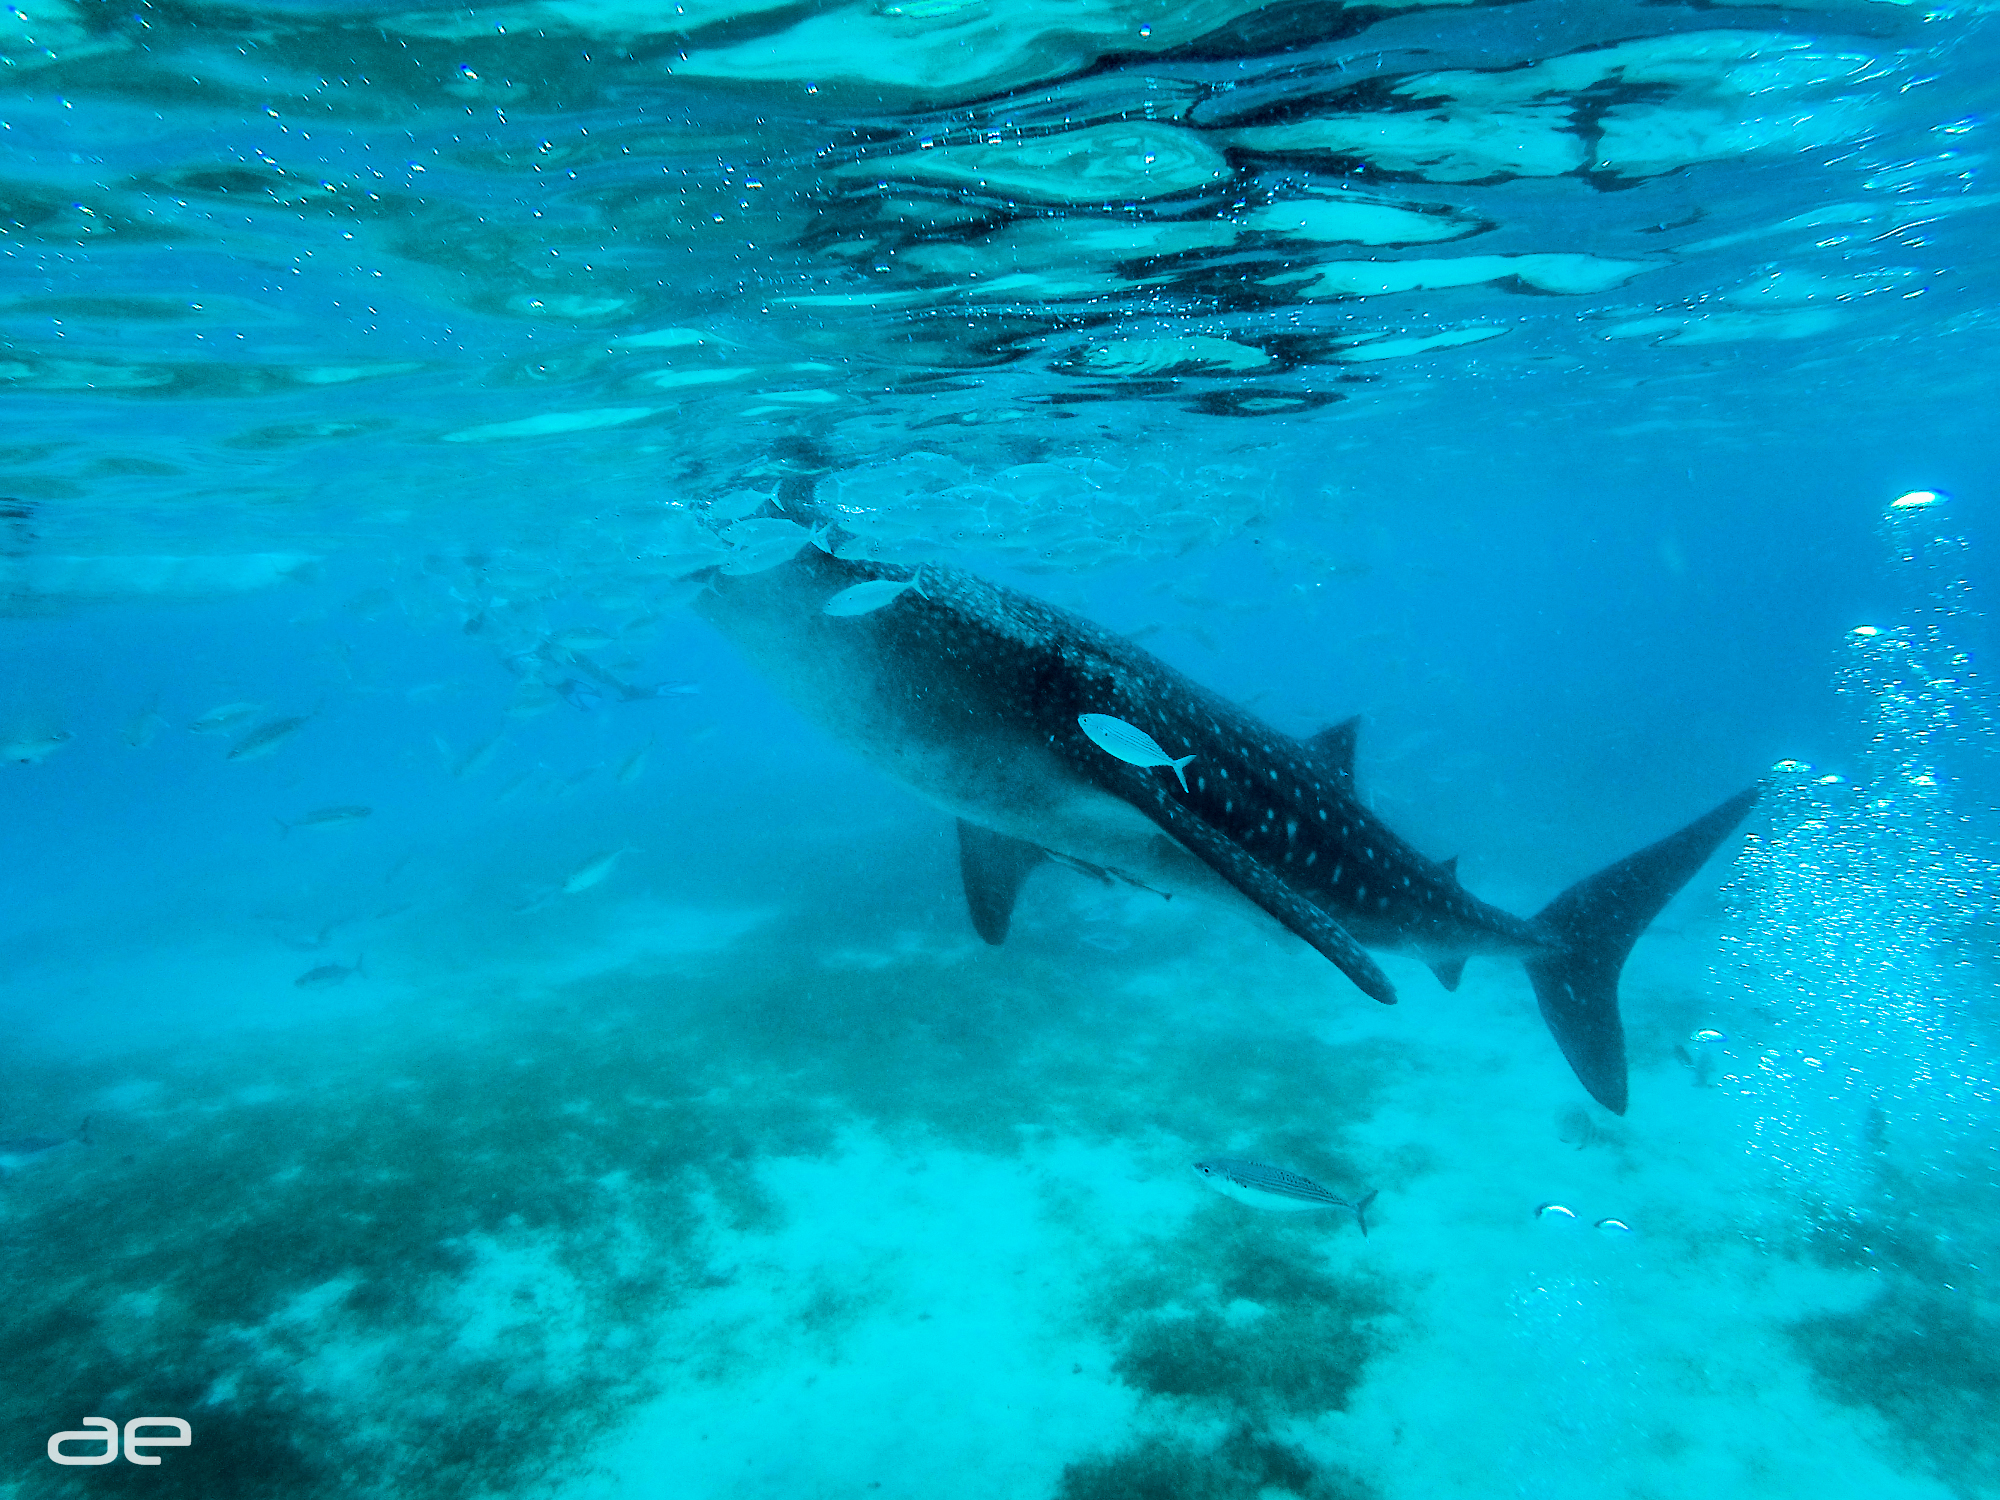 Whale Shark Attraction in Oslob, Cebu